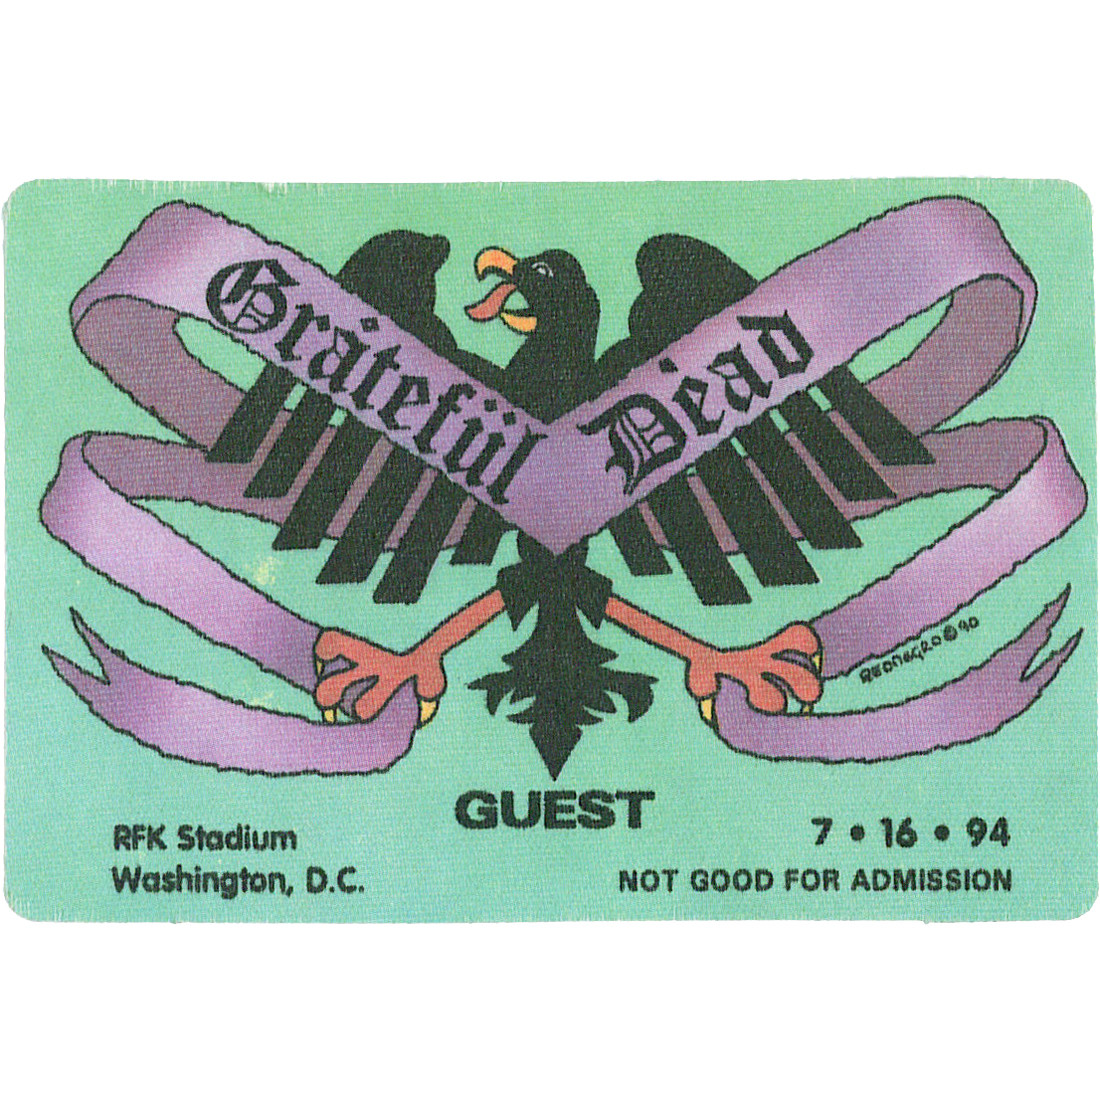 Grateful Dead 1994 07-16 Backstage Pass